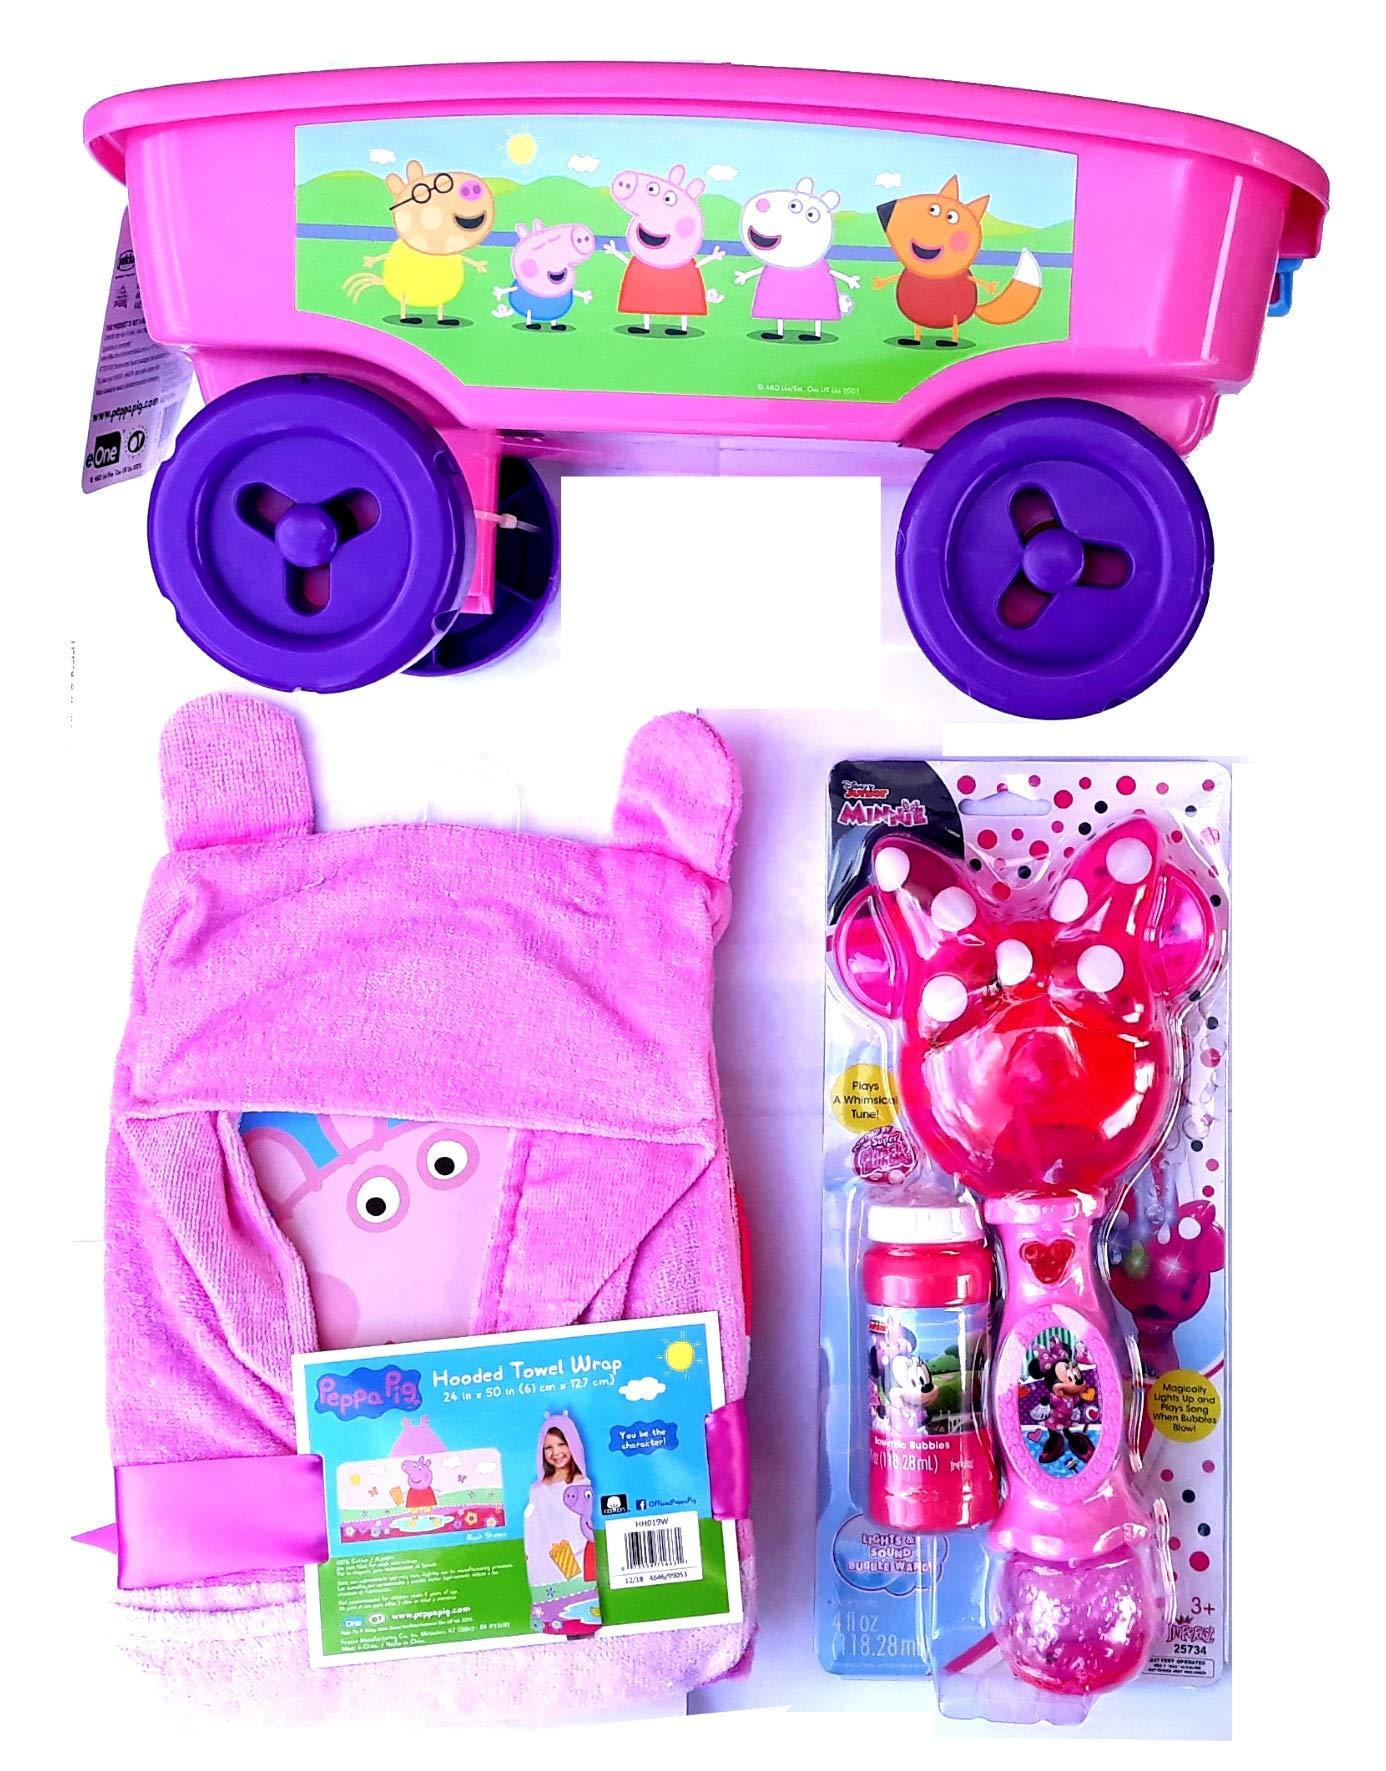 EONE Summer Package: Shovel Wagon, Beach Towel & Bubbles Peppa Pig Characters